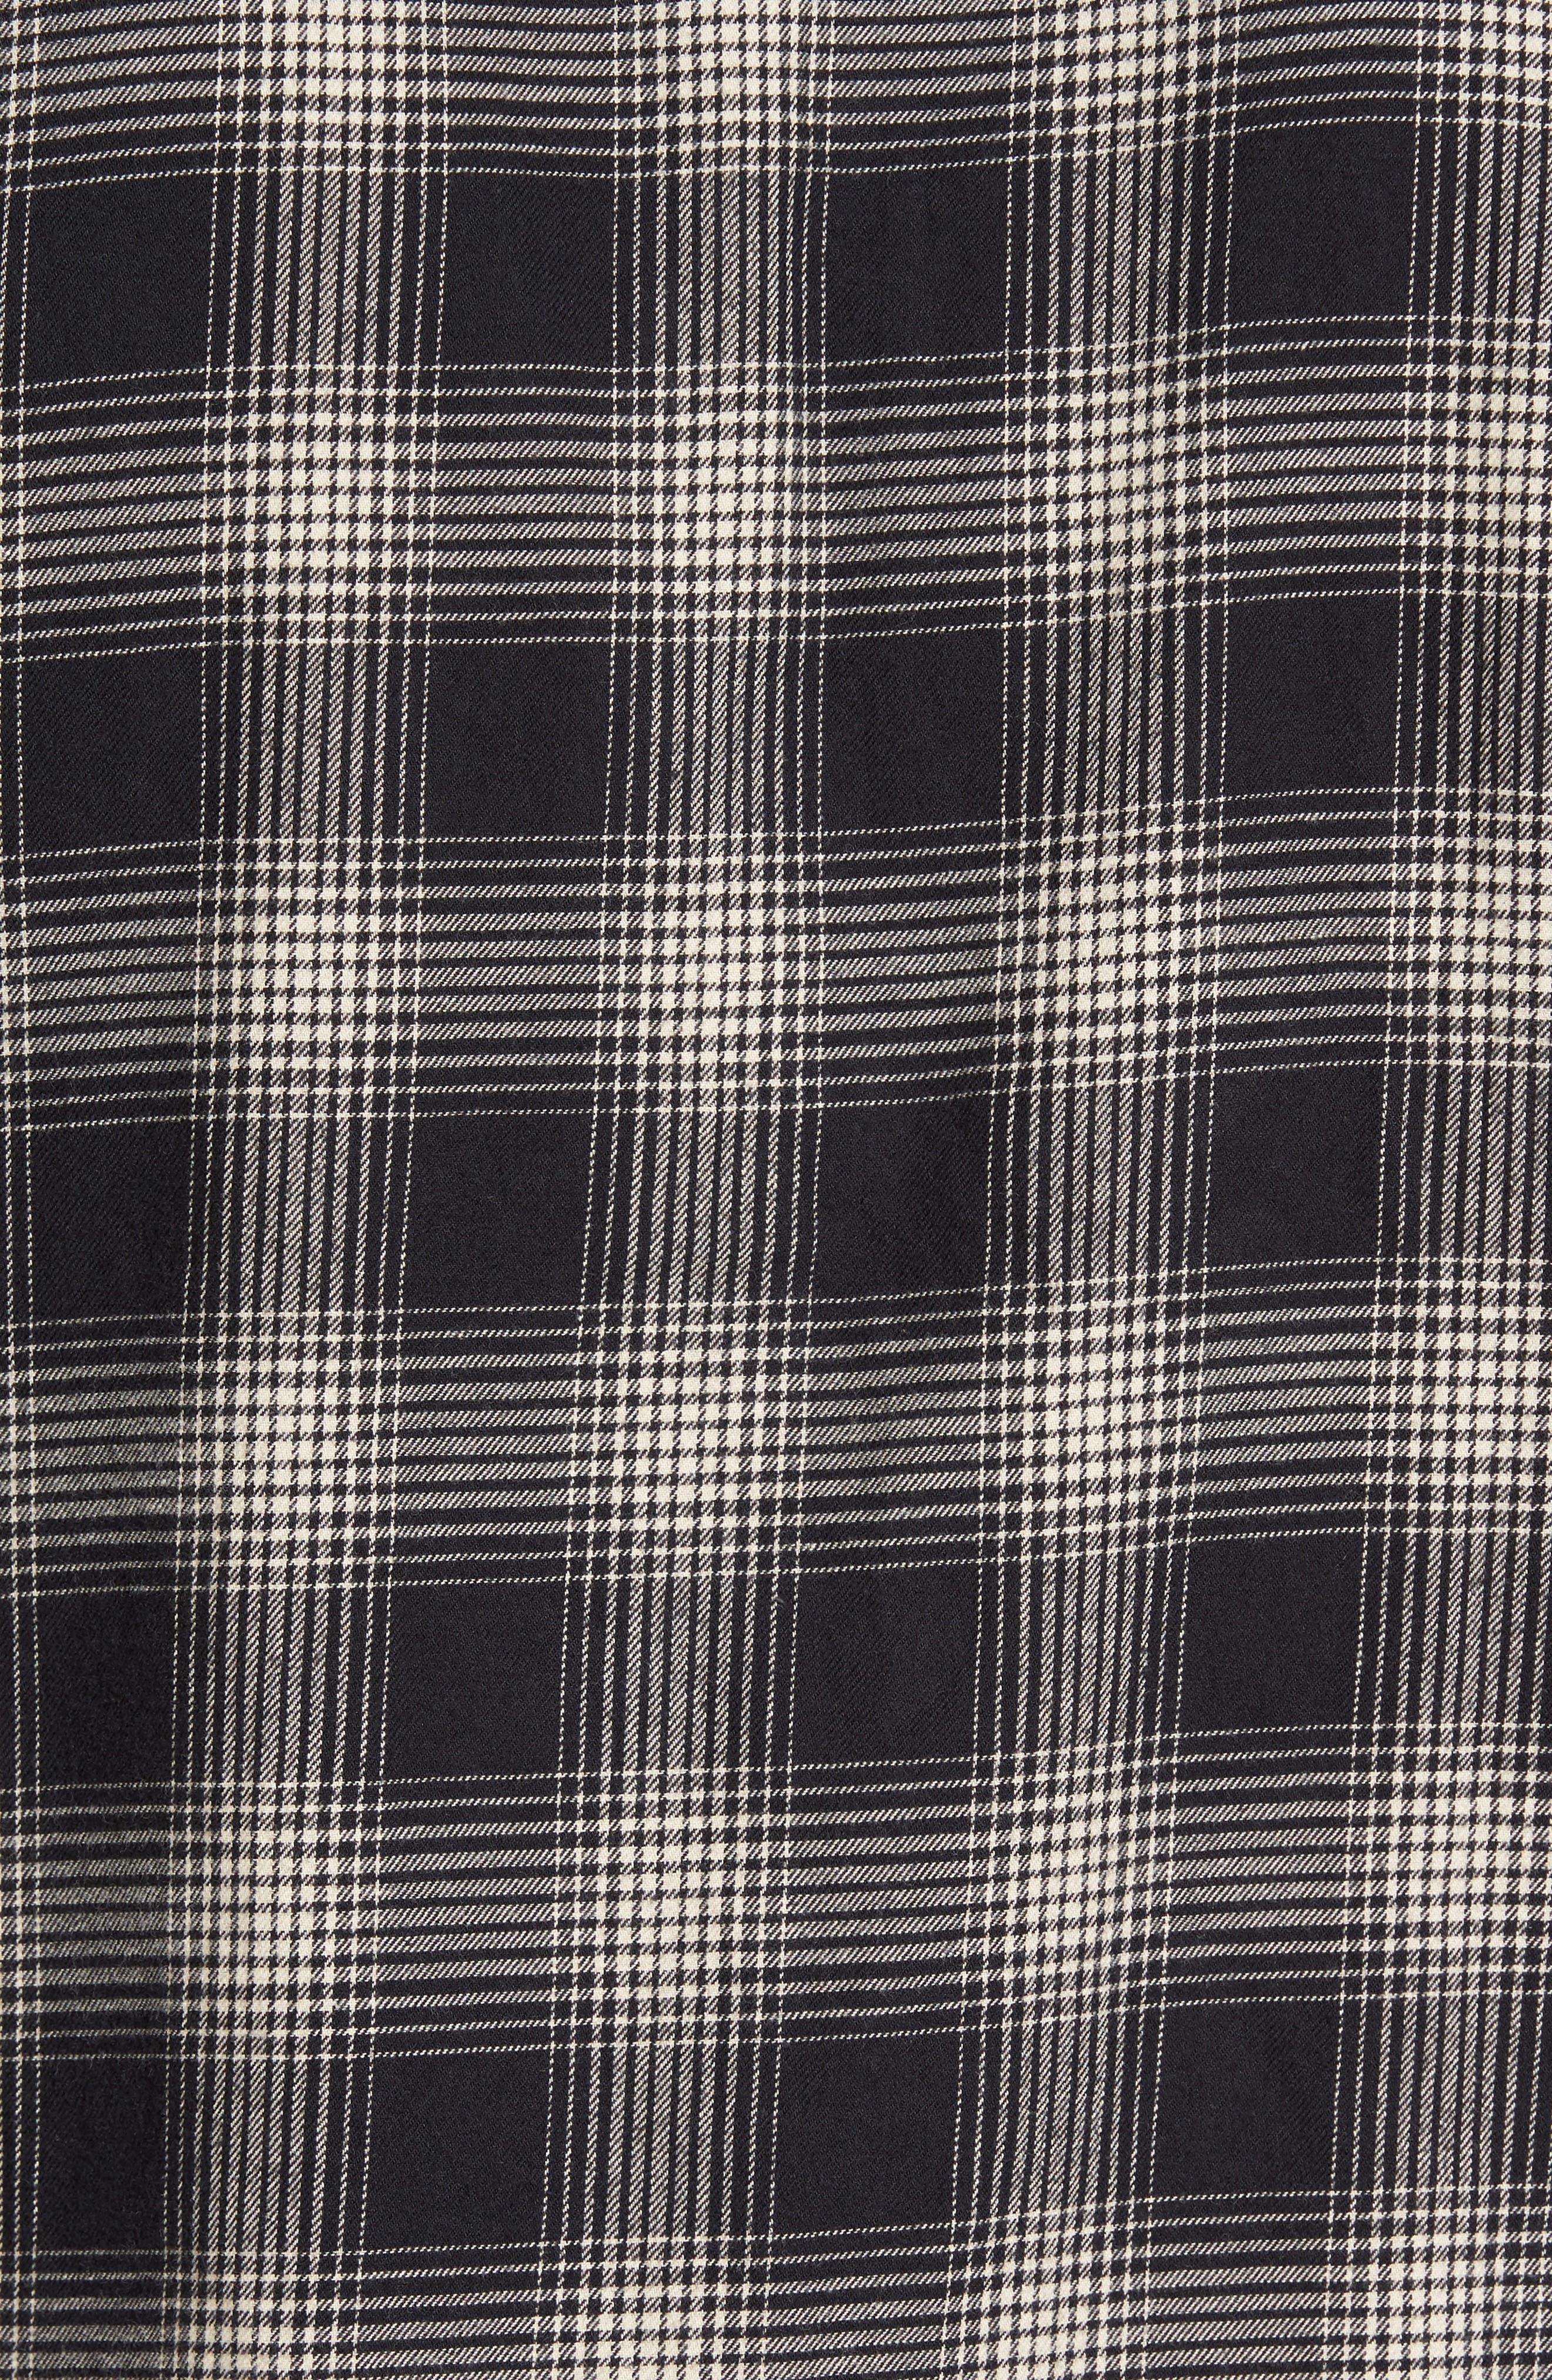 Slim Fit Plaid Brushed Twill Sport Shirt,                             Alternate thumbnail 5, color,                             Black/ Brown Plaid